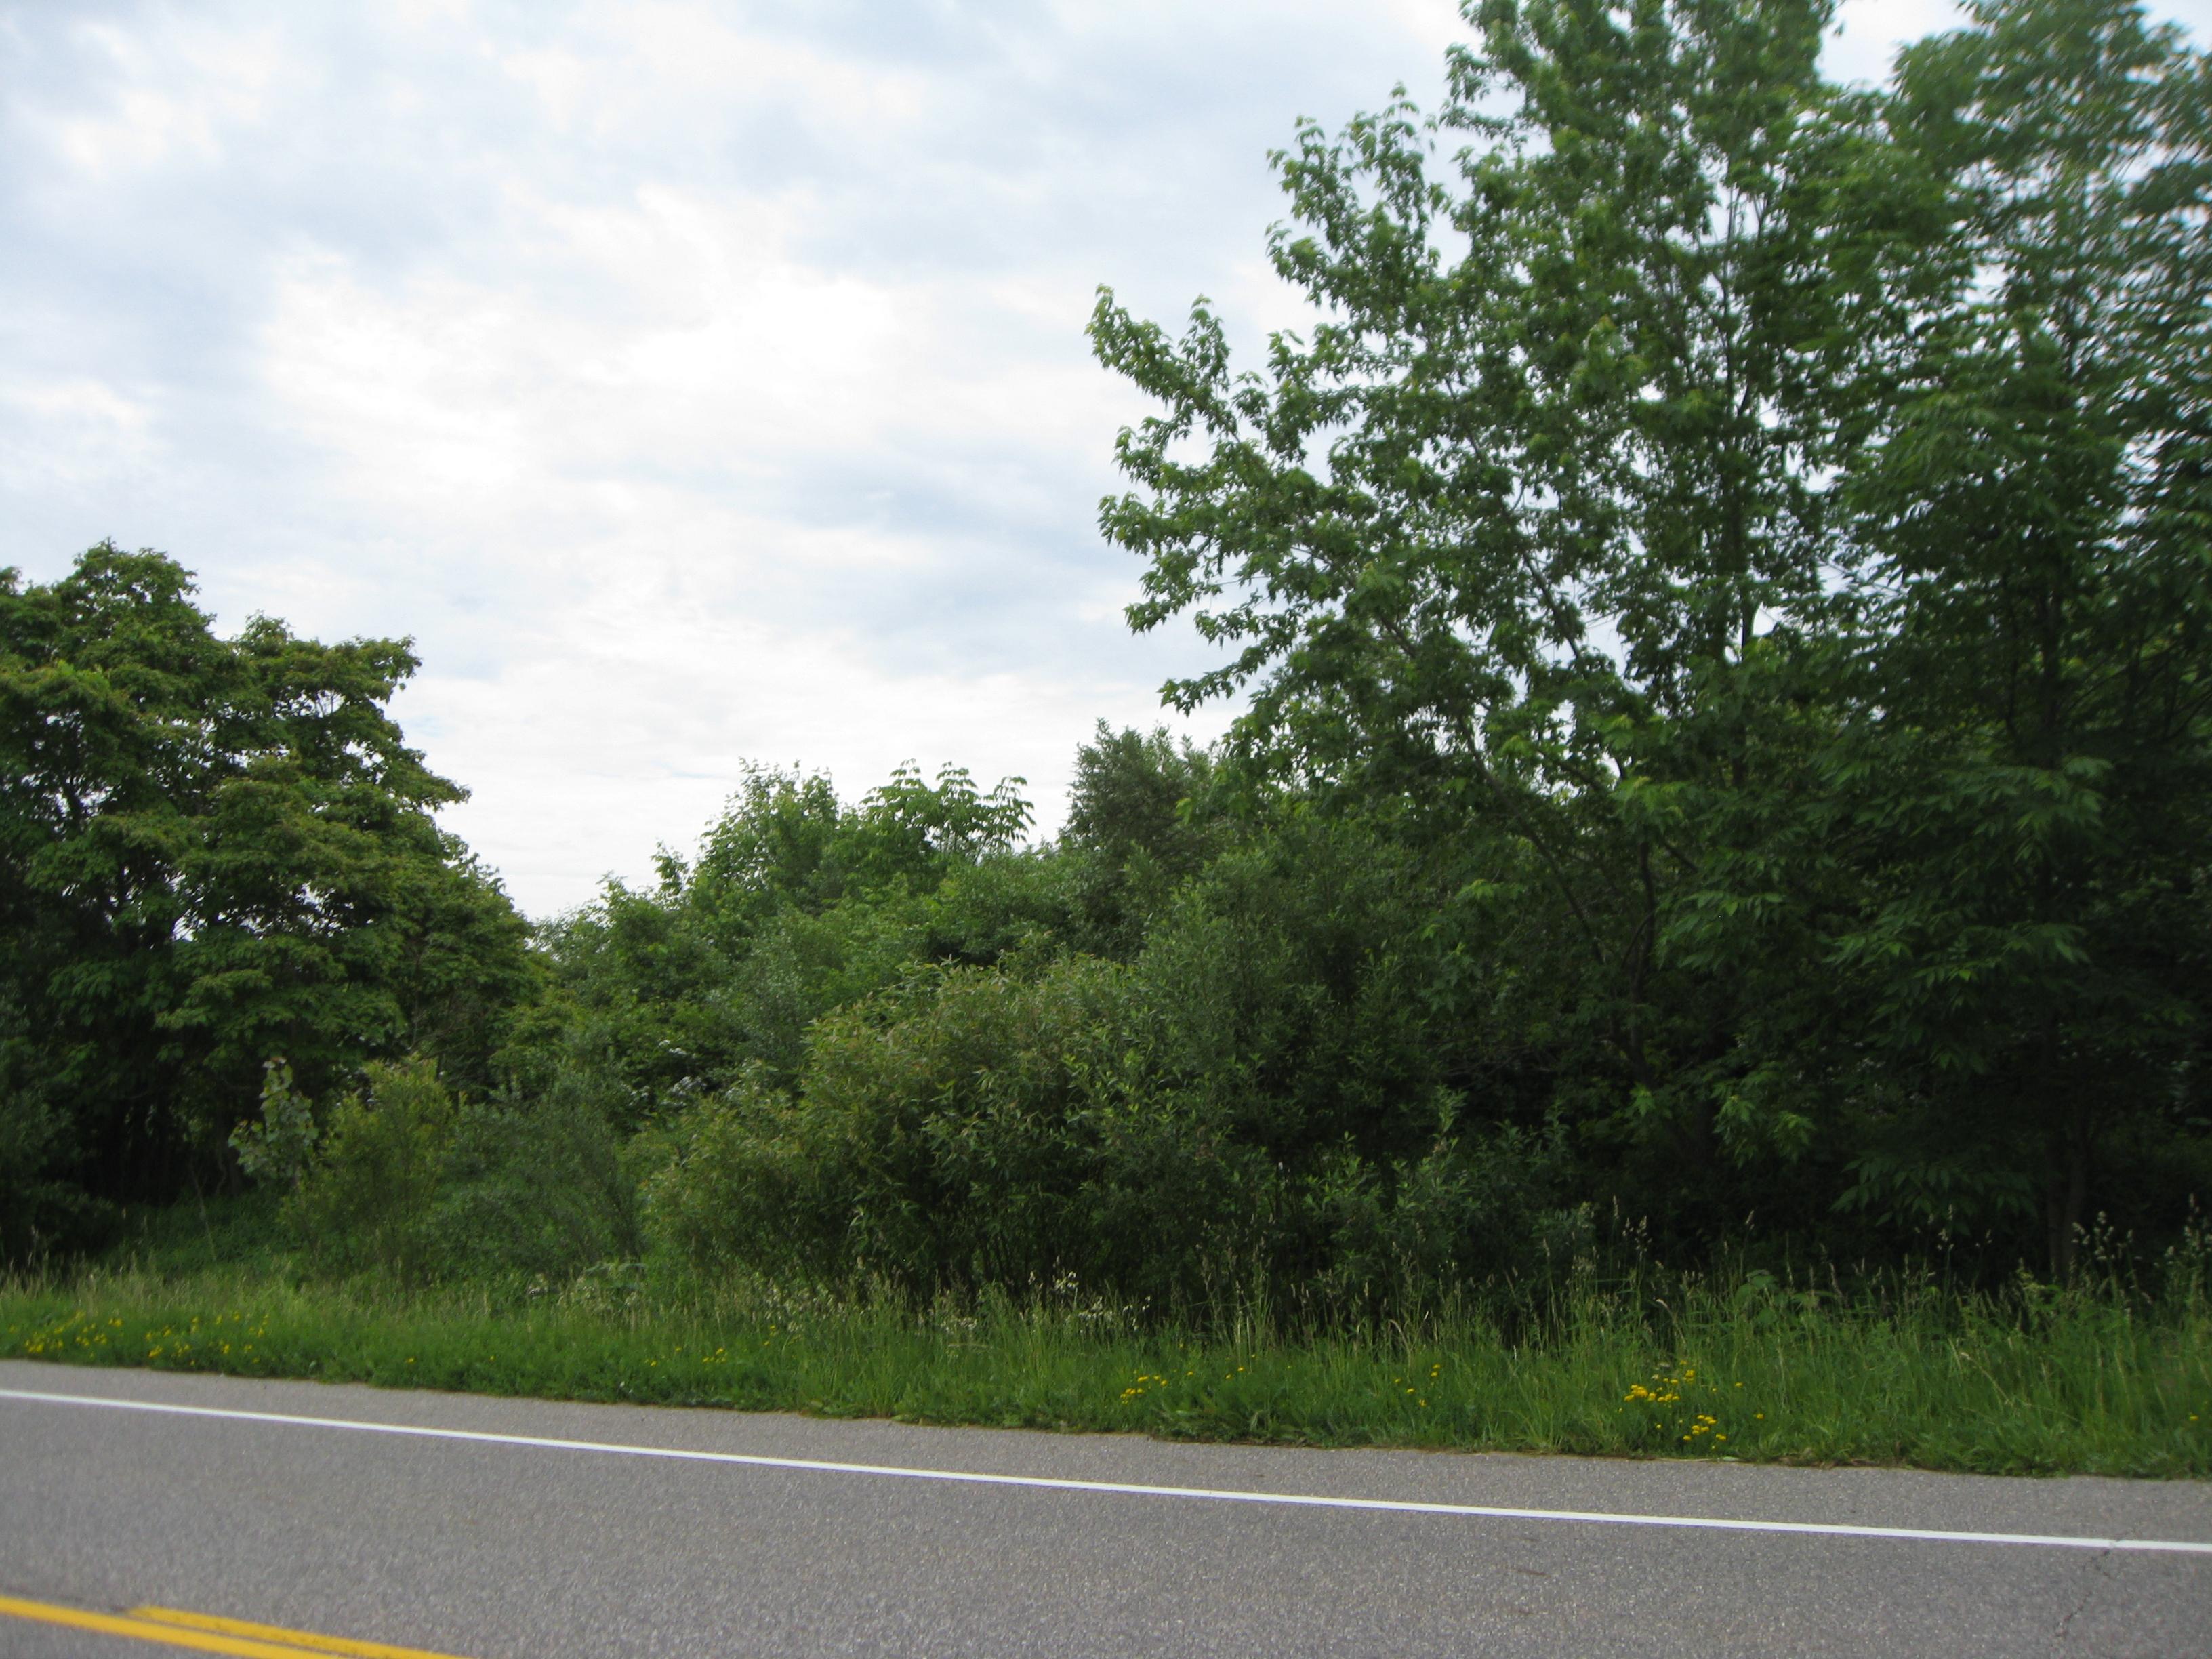 Land for Sale at 1 136th Avenue Saugatuck, Michigan 49453 United States